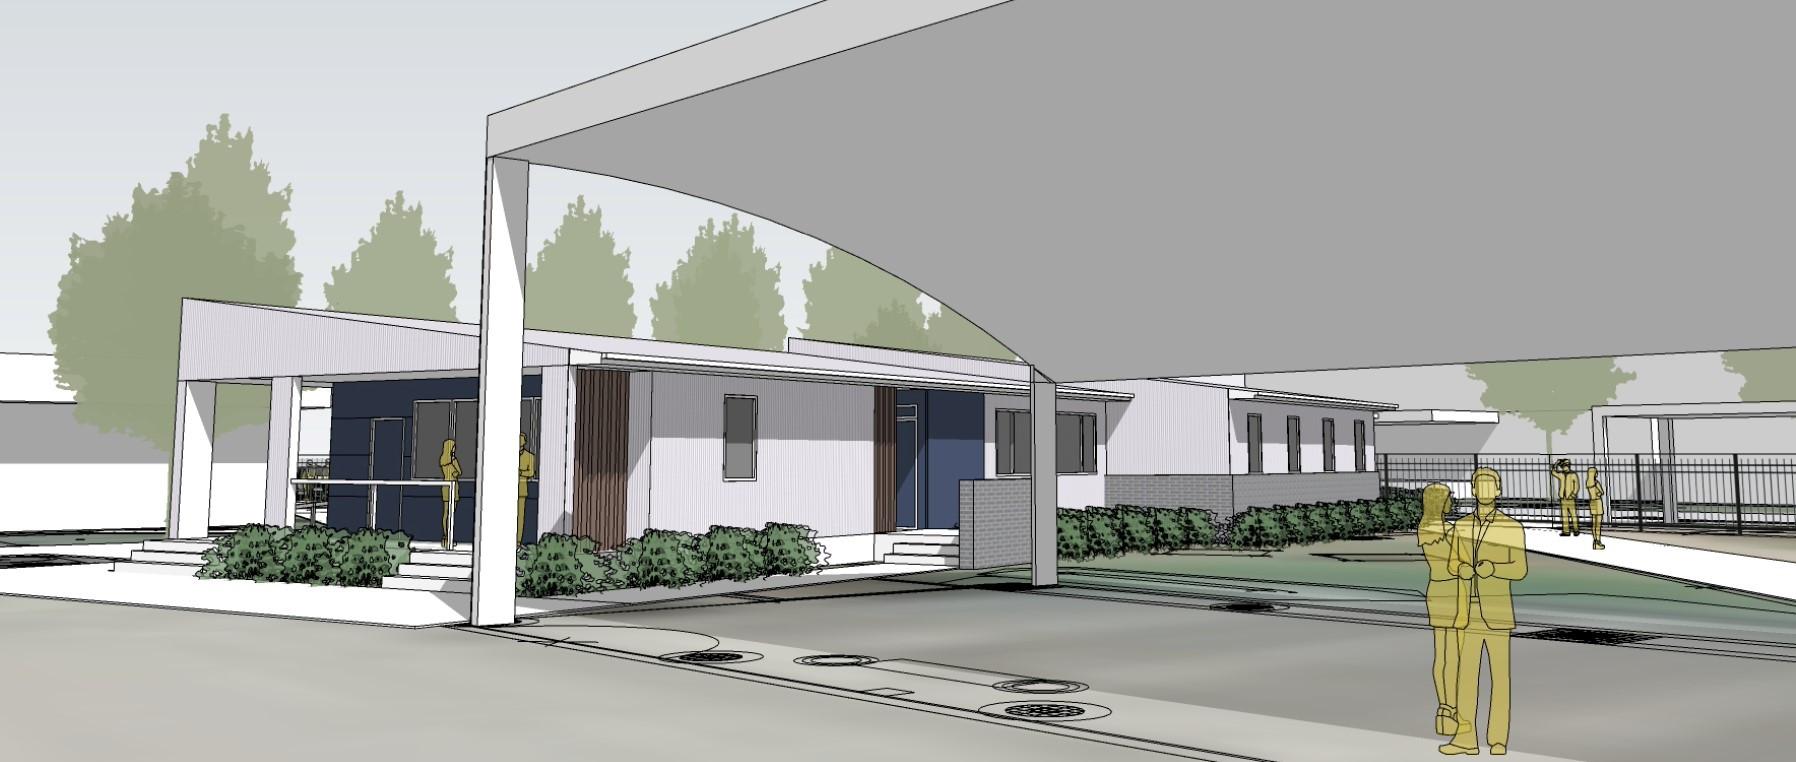 new building plan 3.jpg